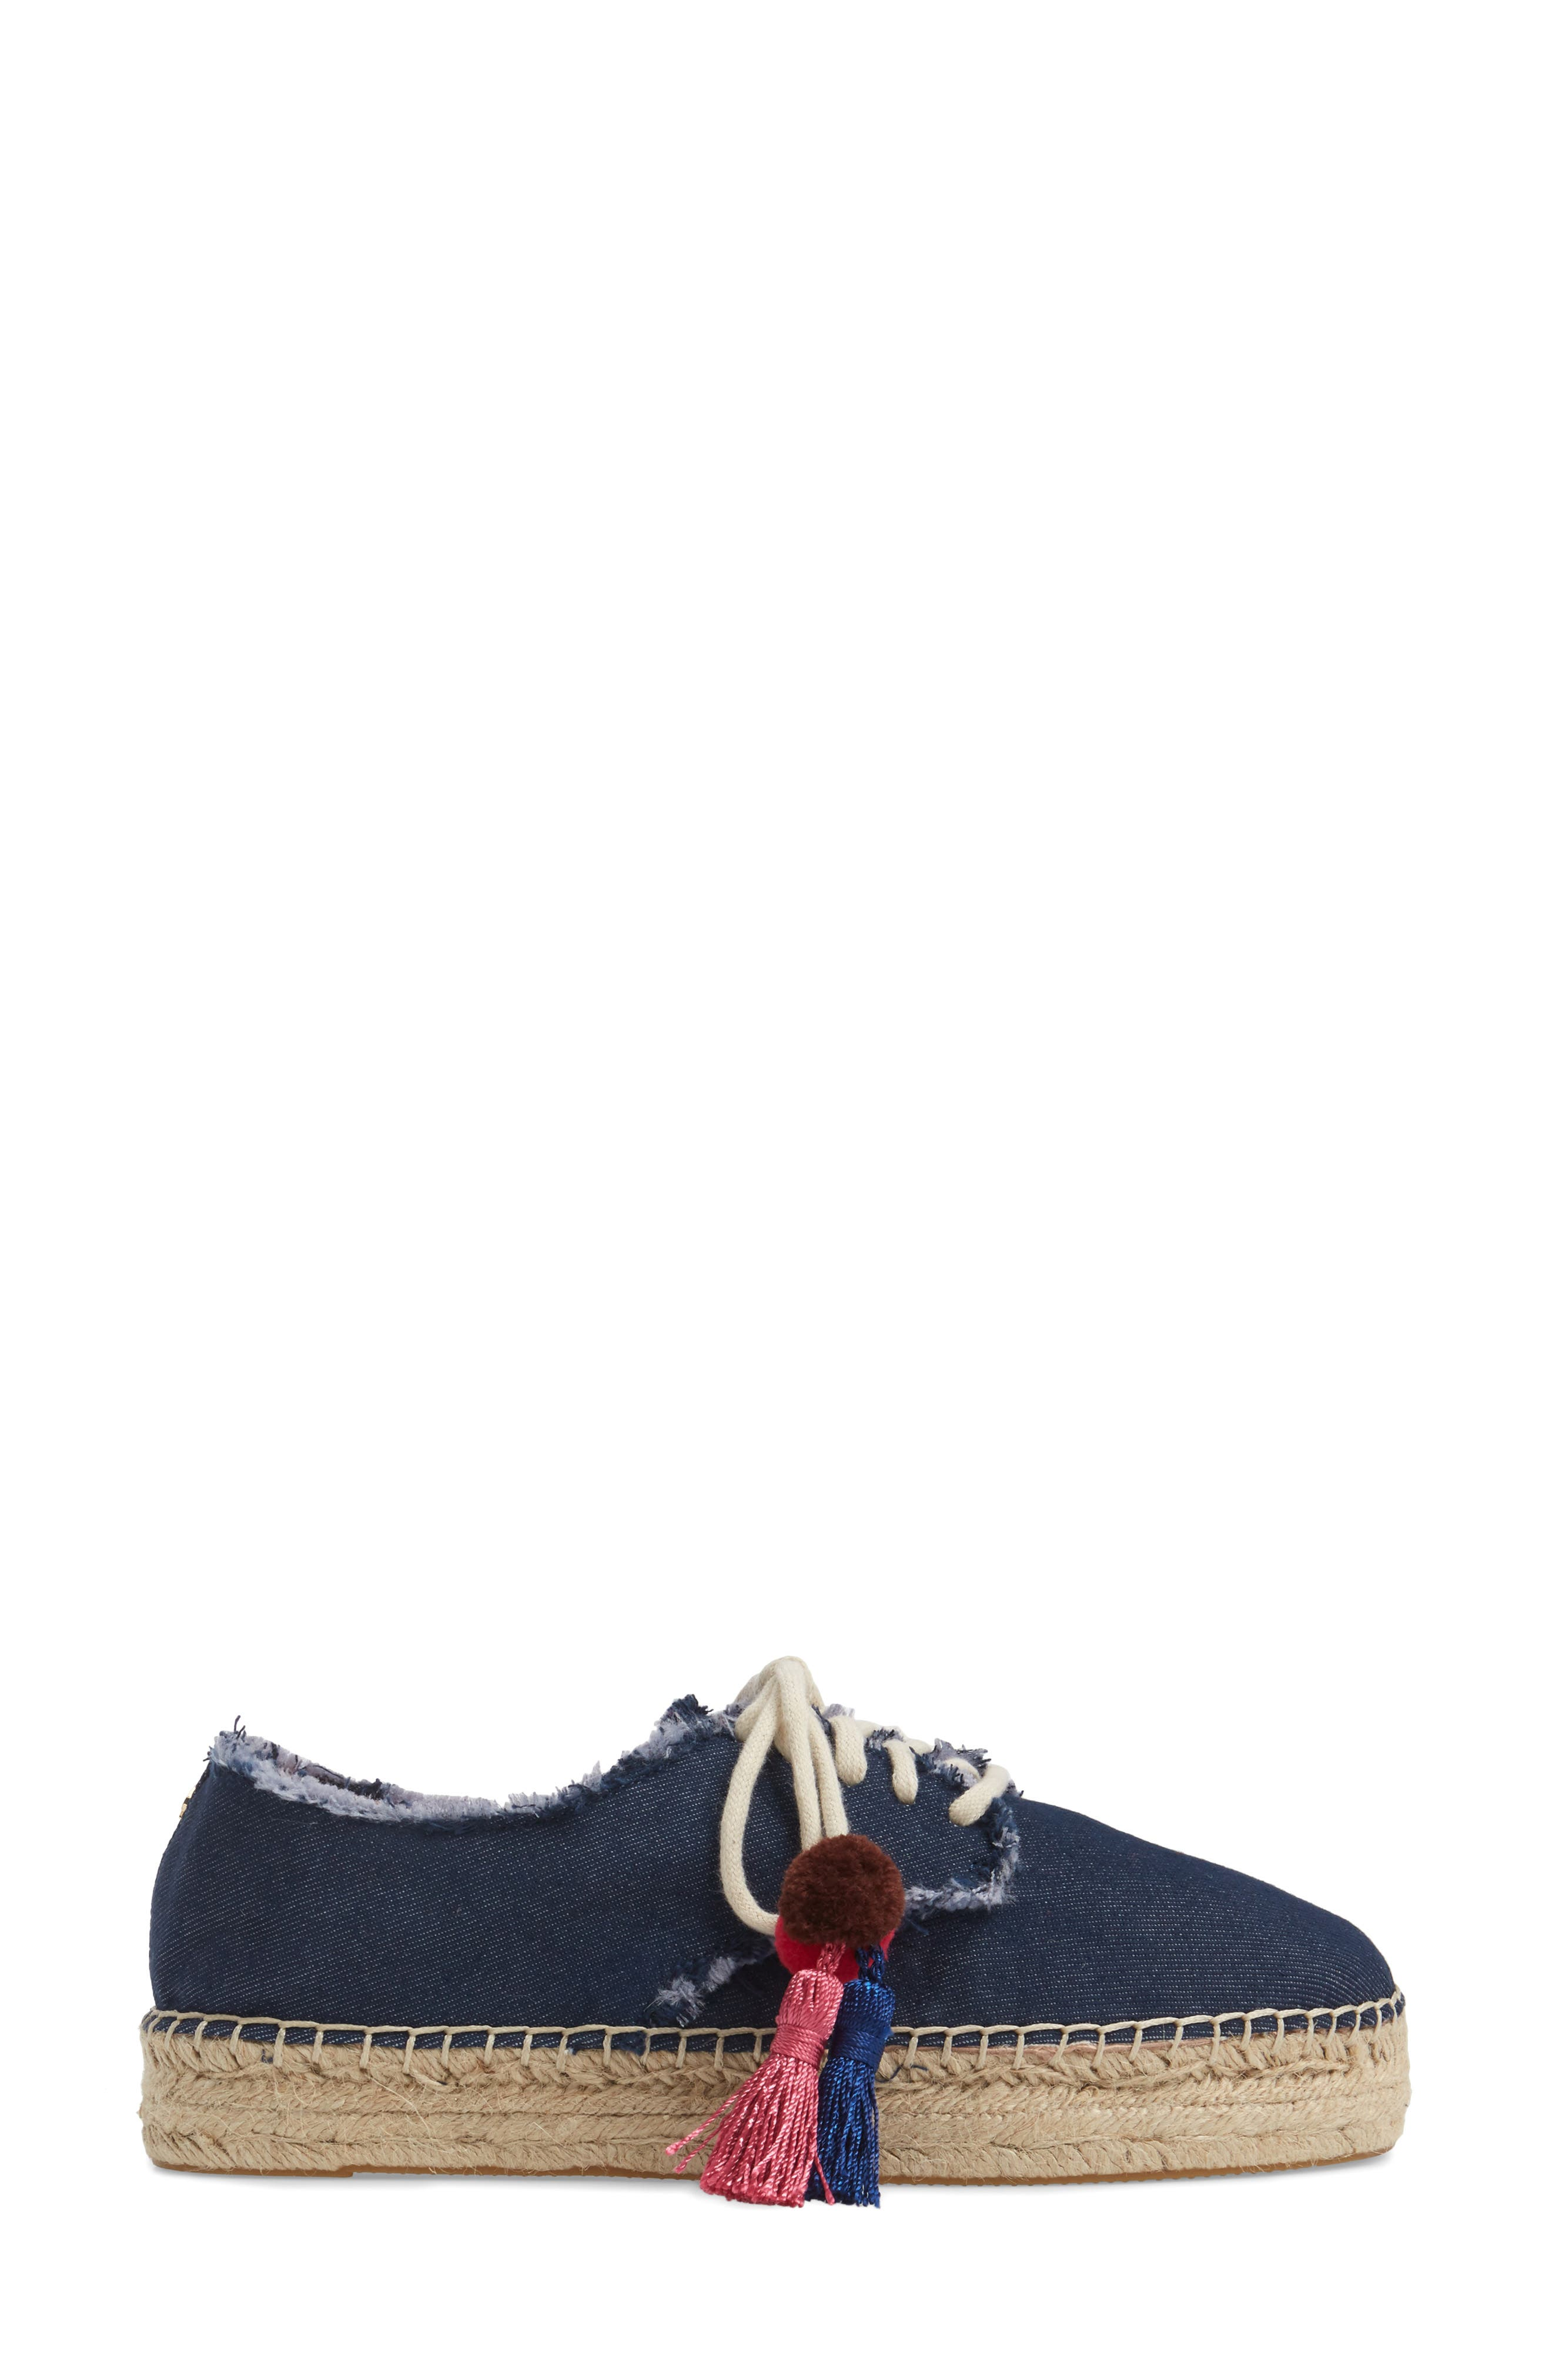 lane espadrille platform sneaker,                             Alternate thumbnail 3, color,                             Blue Jeans